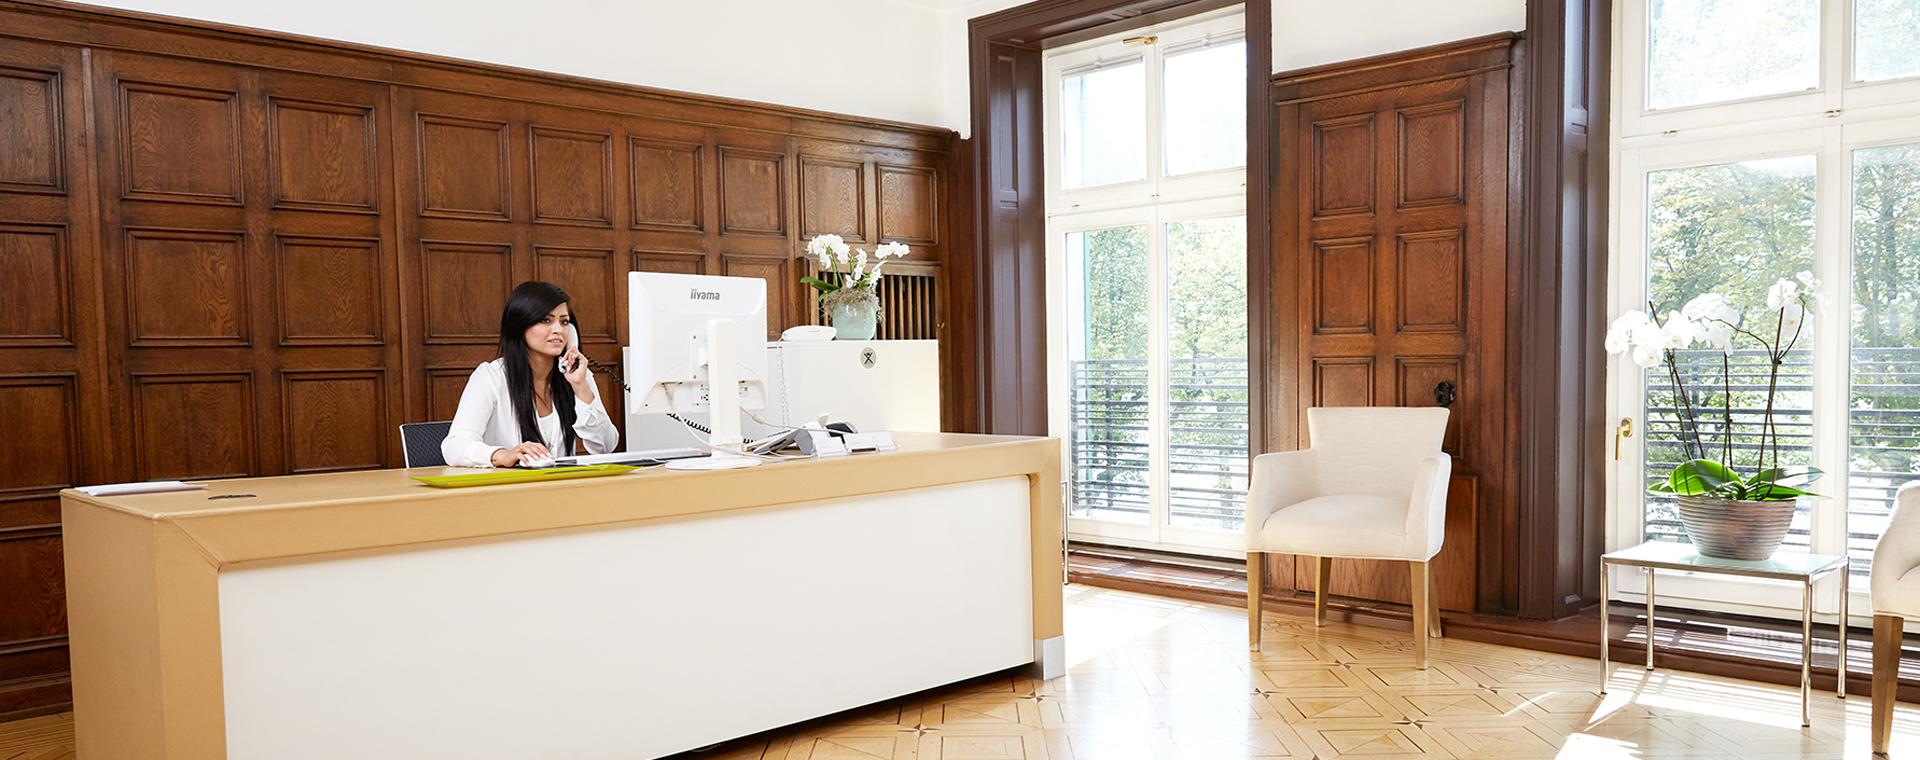 Keramikimplantat-Hamburg-Praxisraeume-Oralchirurgie-Header